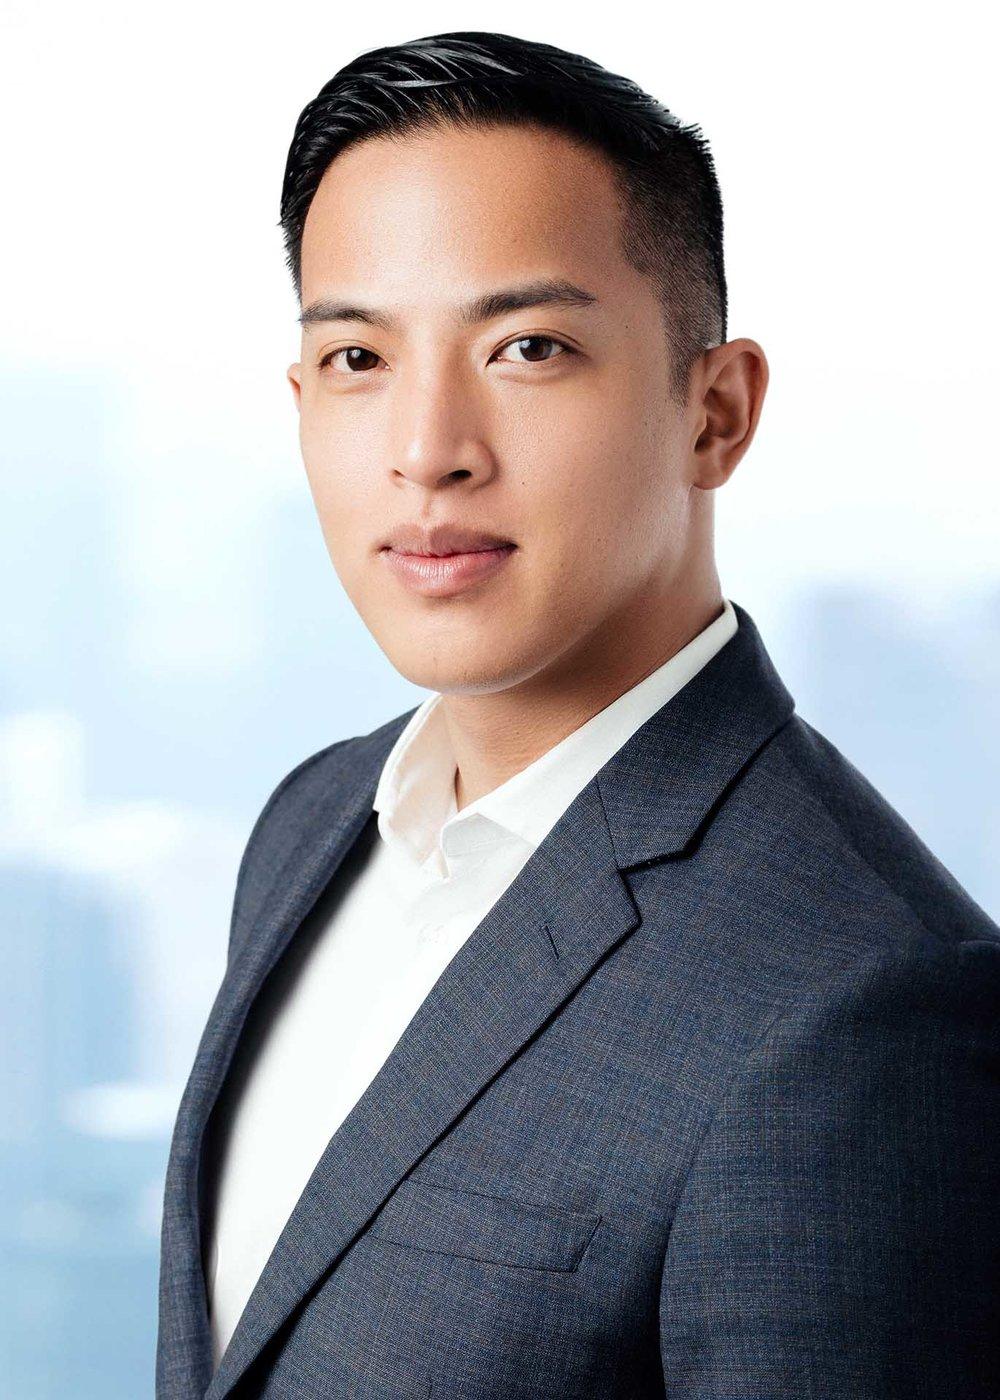 Hedshots-NYC-Profeesional-CEOportraits-2-2.jpg